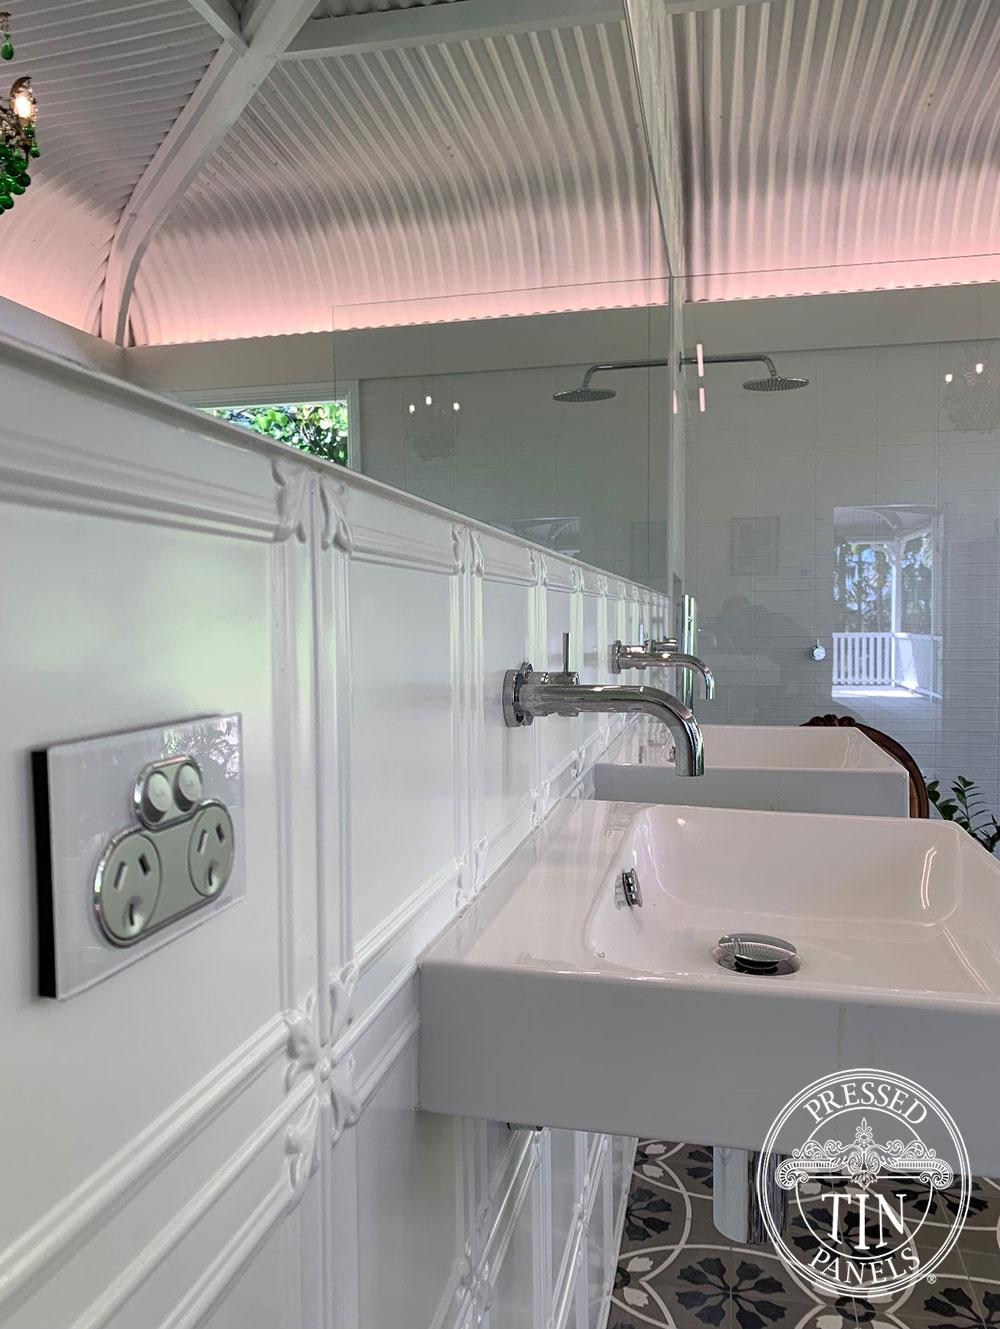 PressedTinPanels_Maddington_Bathroom_White_WaddiLove